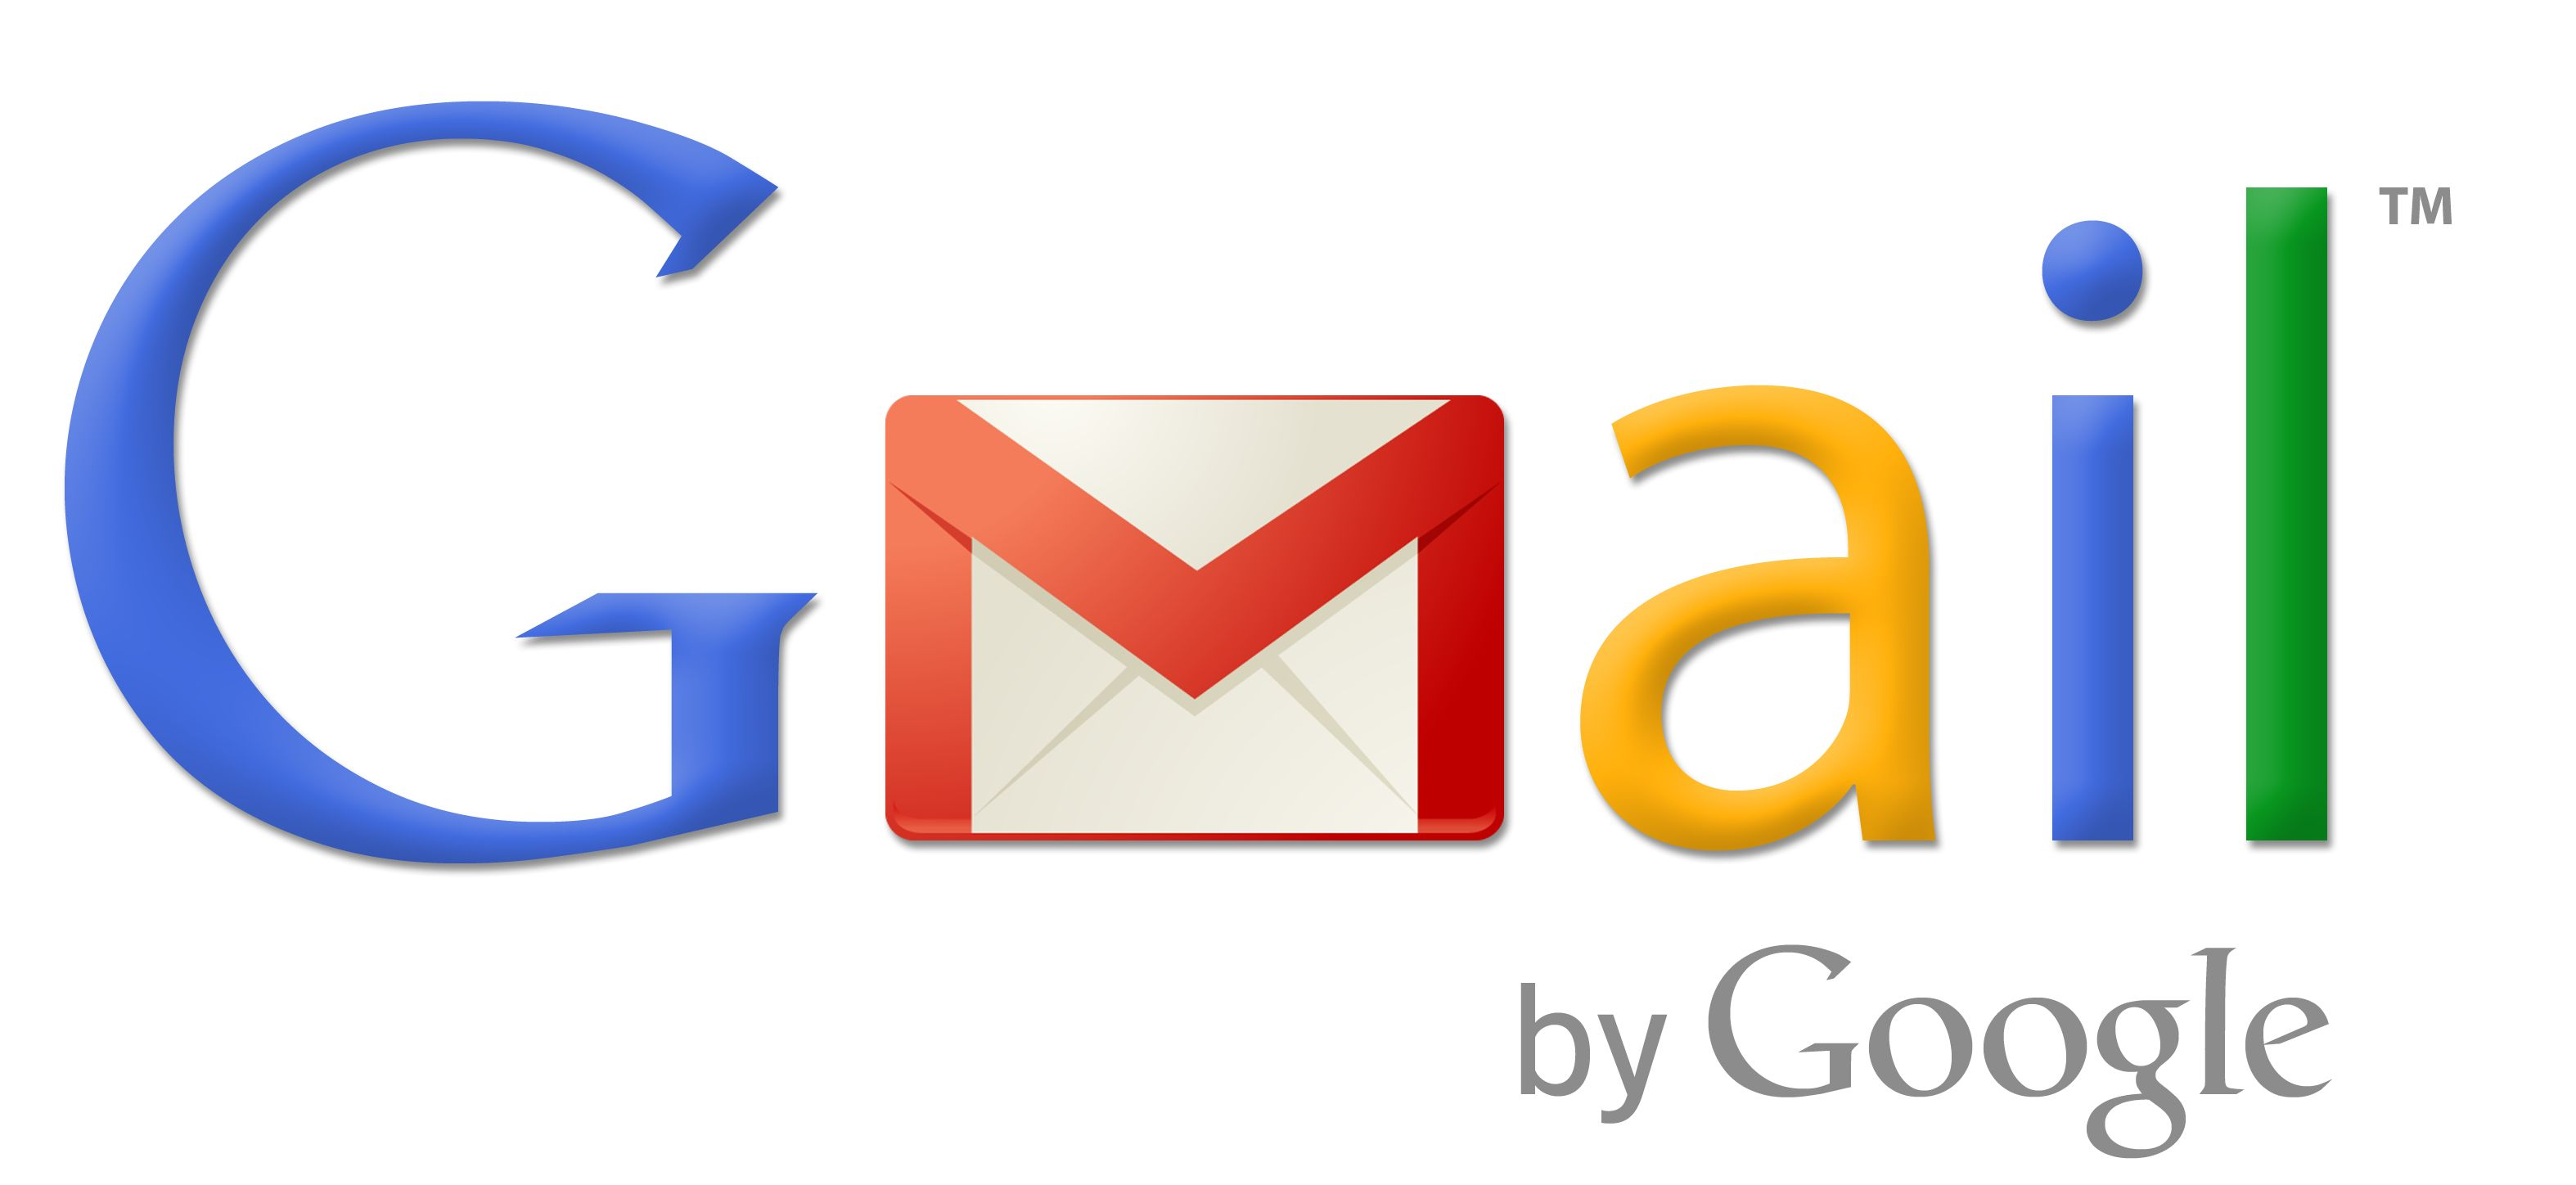 gmail account creation logo